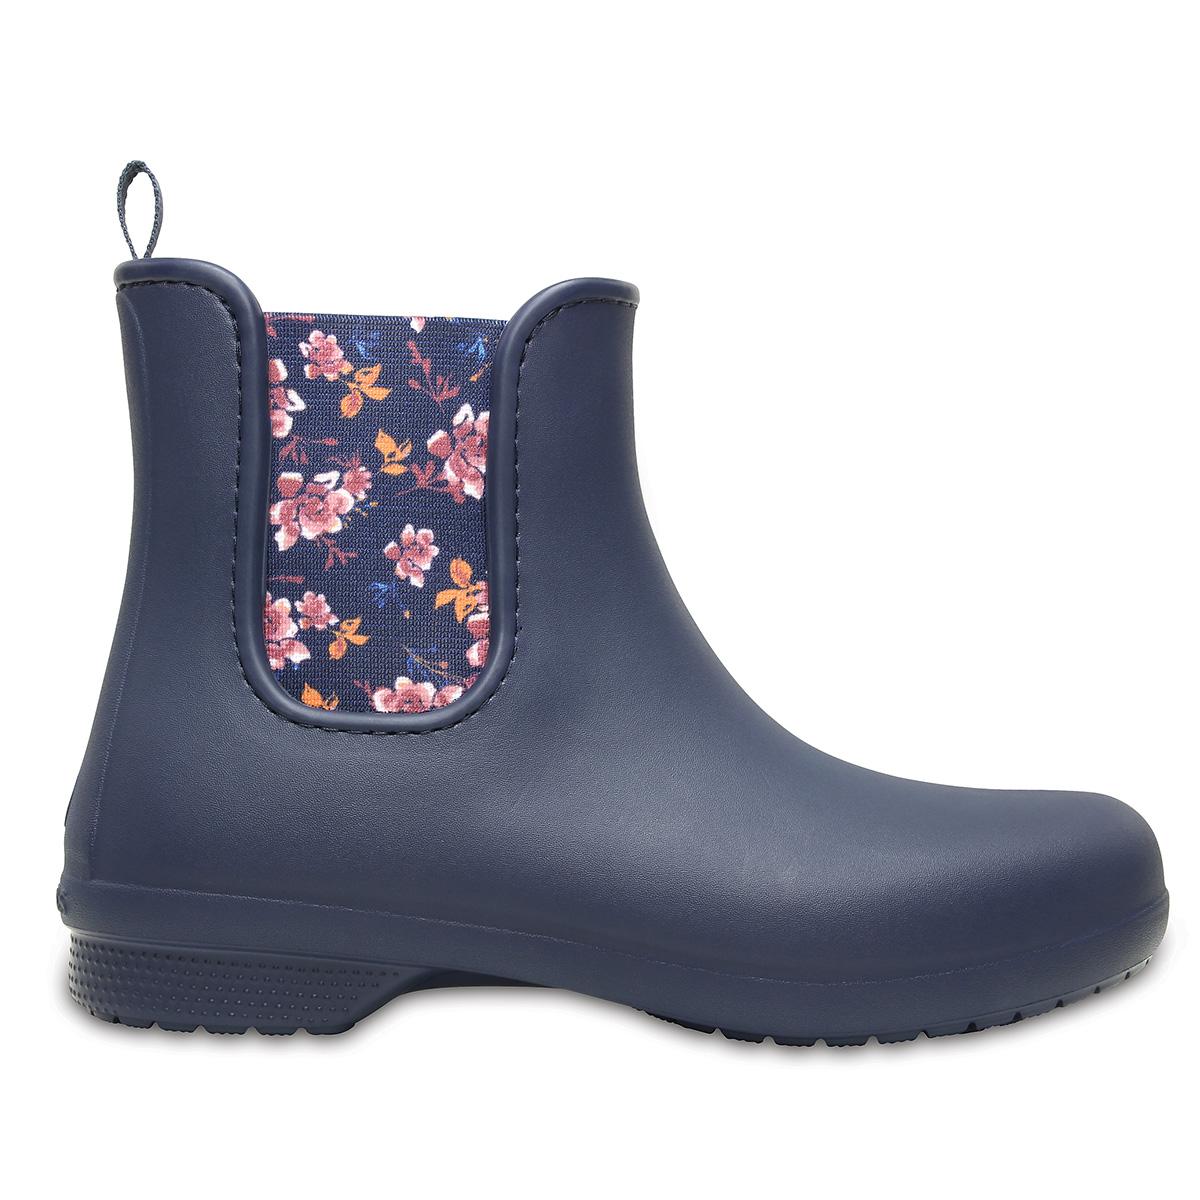 Crocs Freesail Chelsea Boot W - Lacivert/Çiçekli